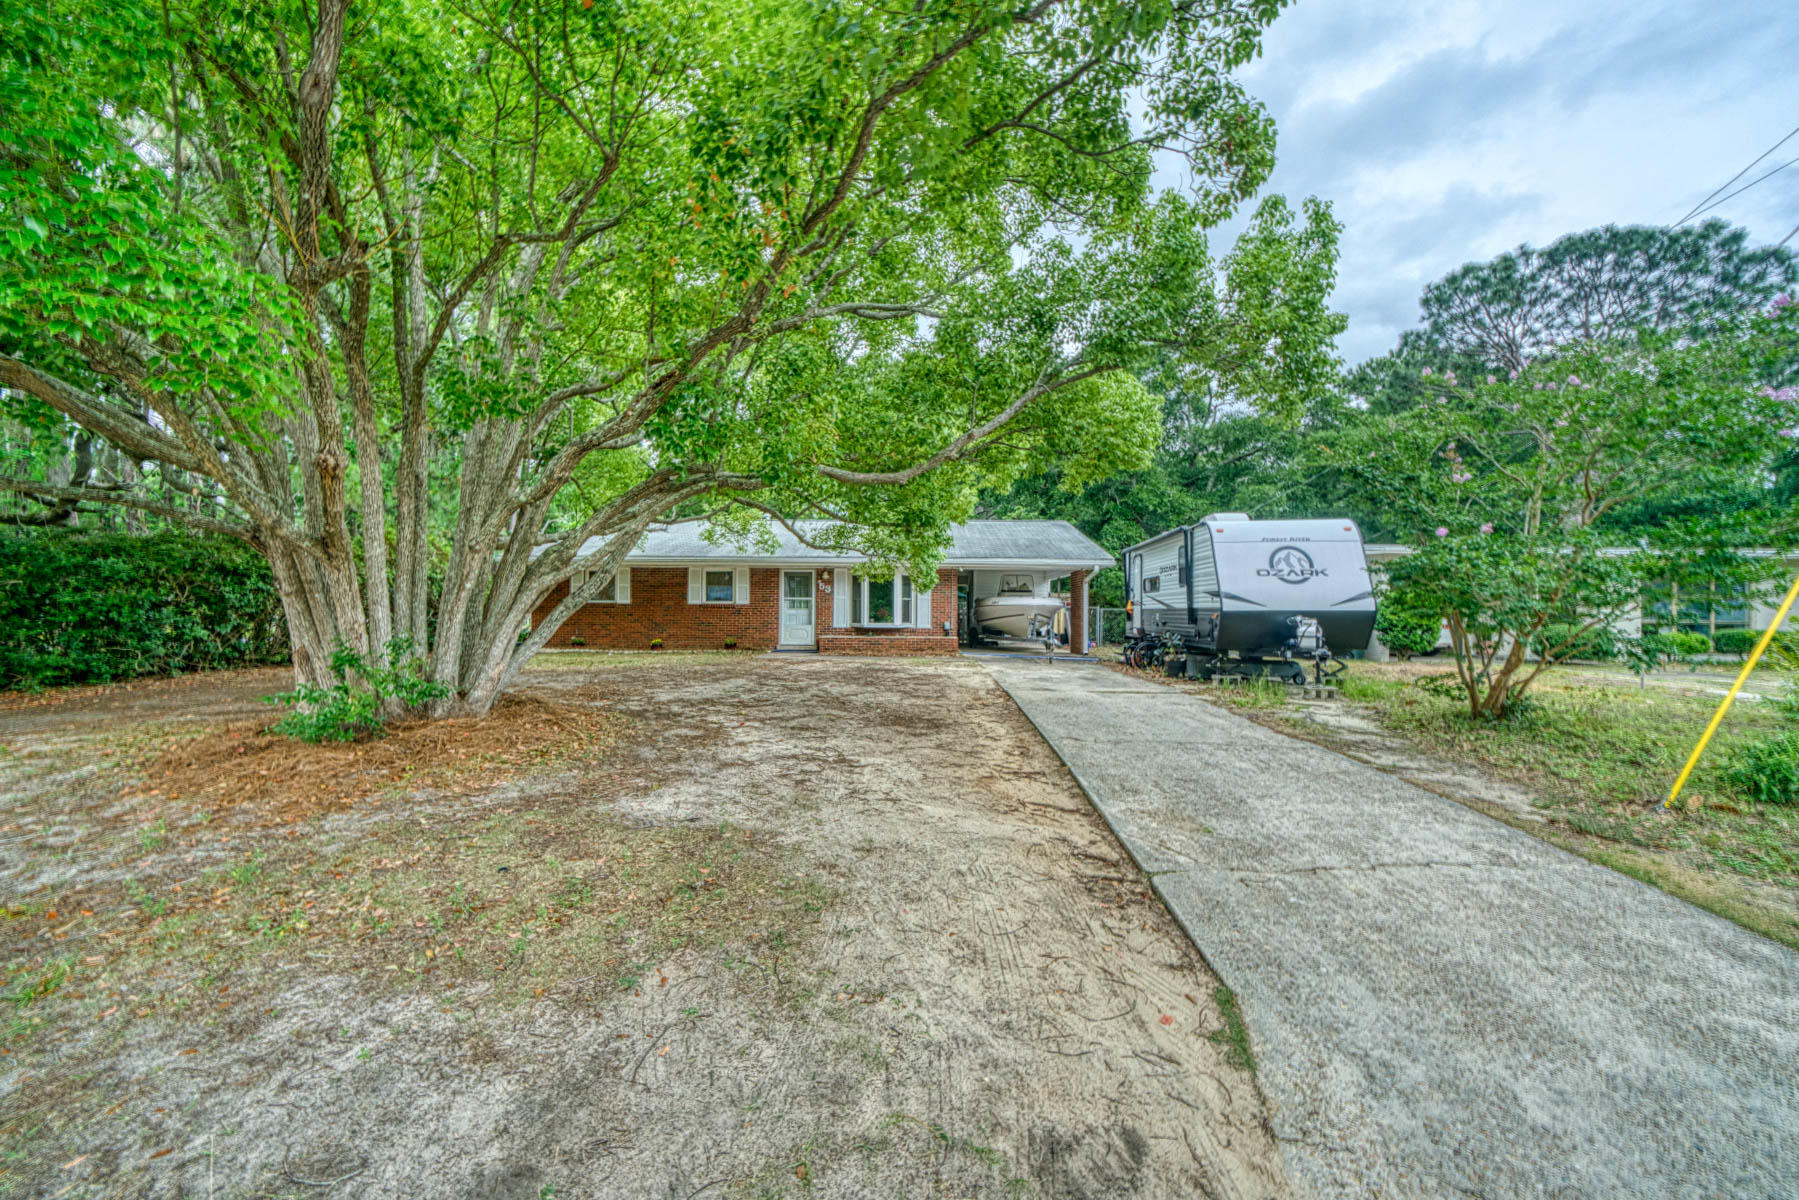 Photo of home for sale at 53 Arizona, Fort Walton Beach FL